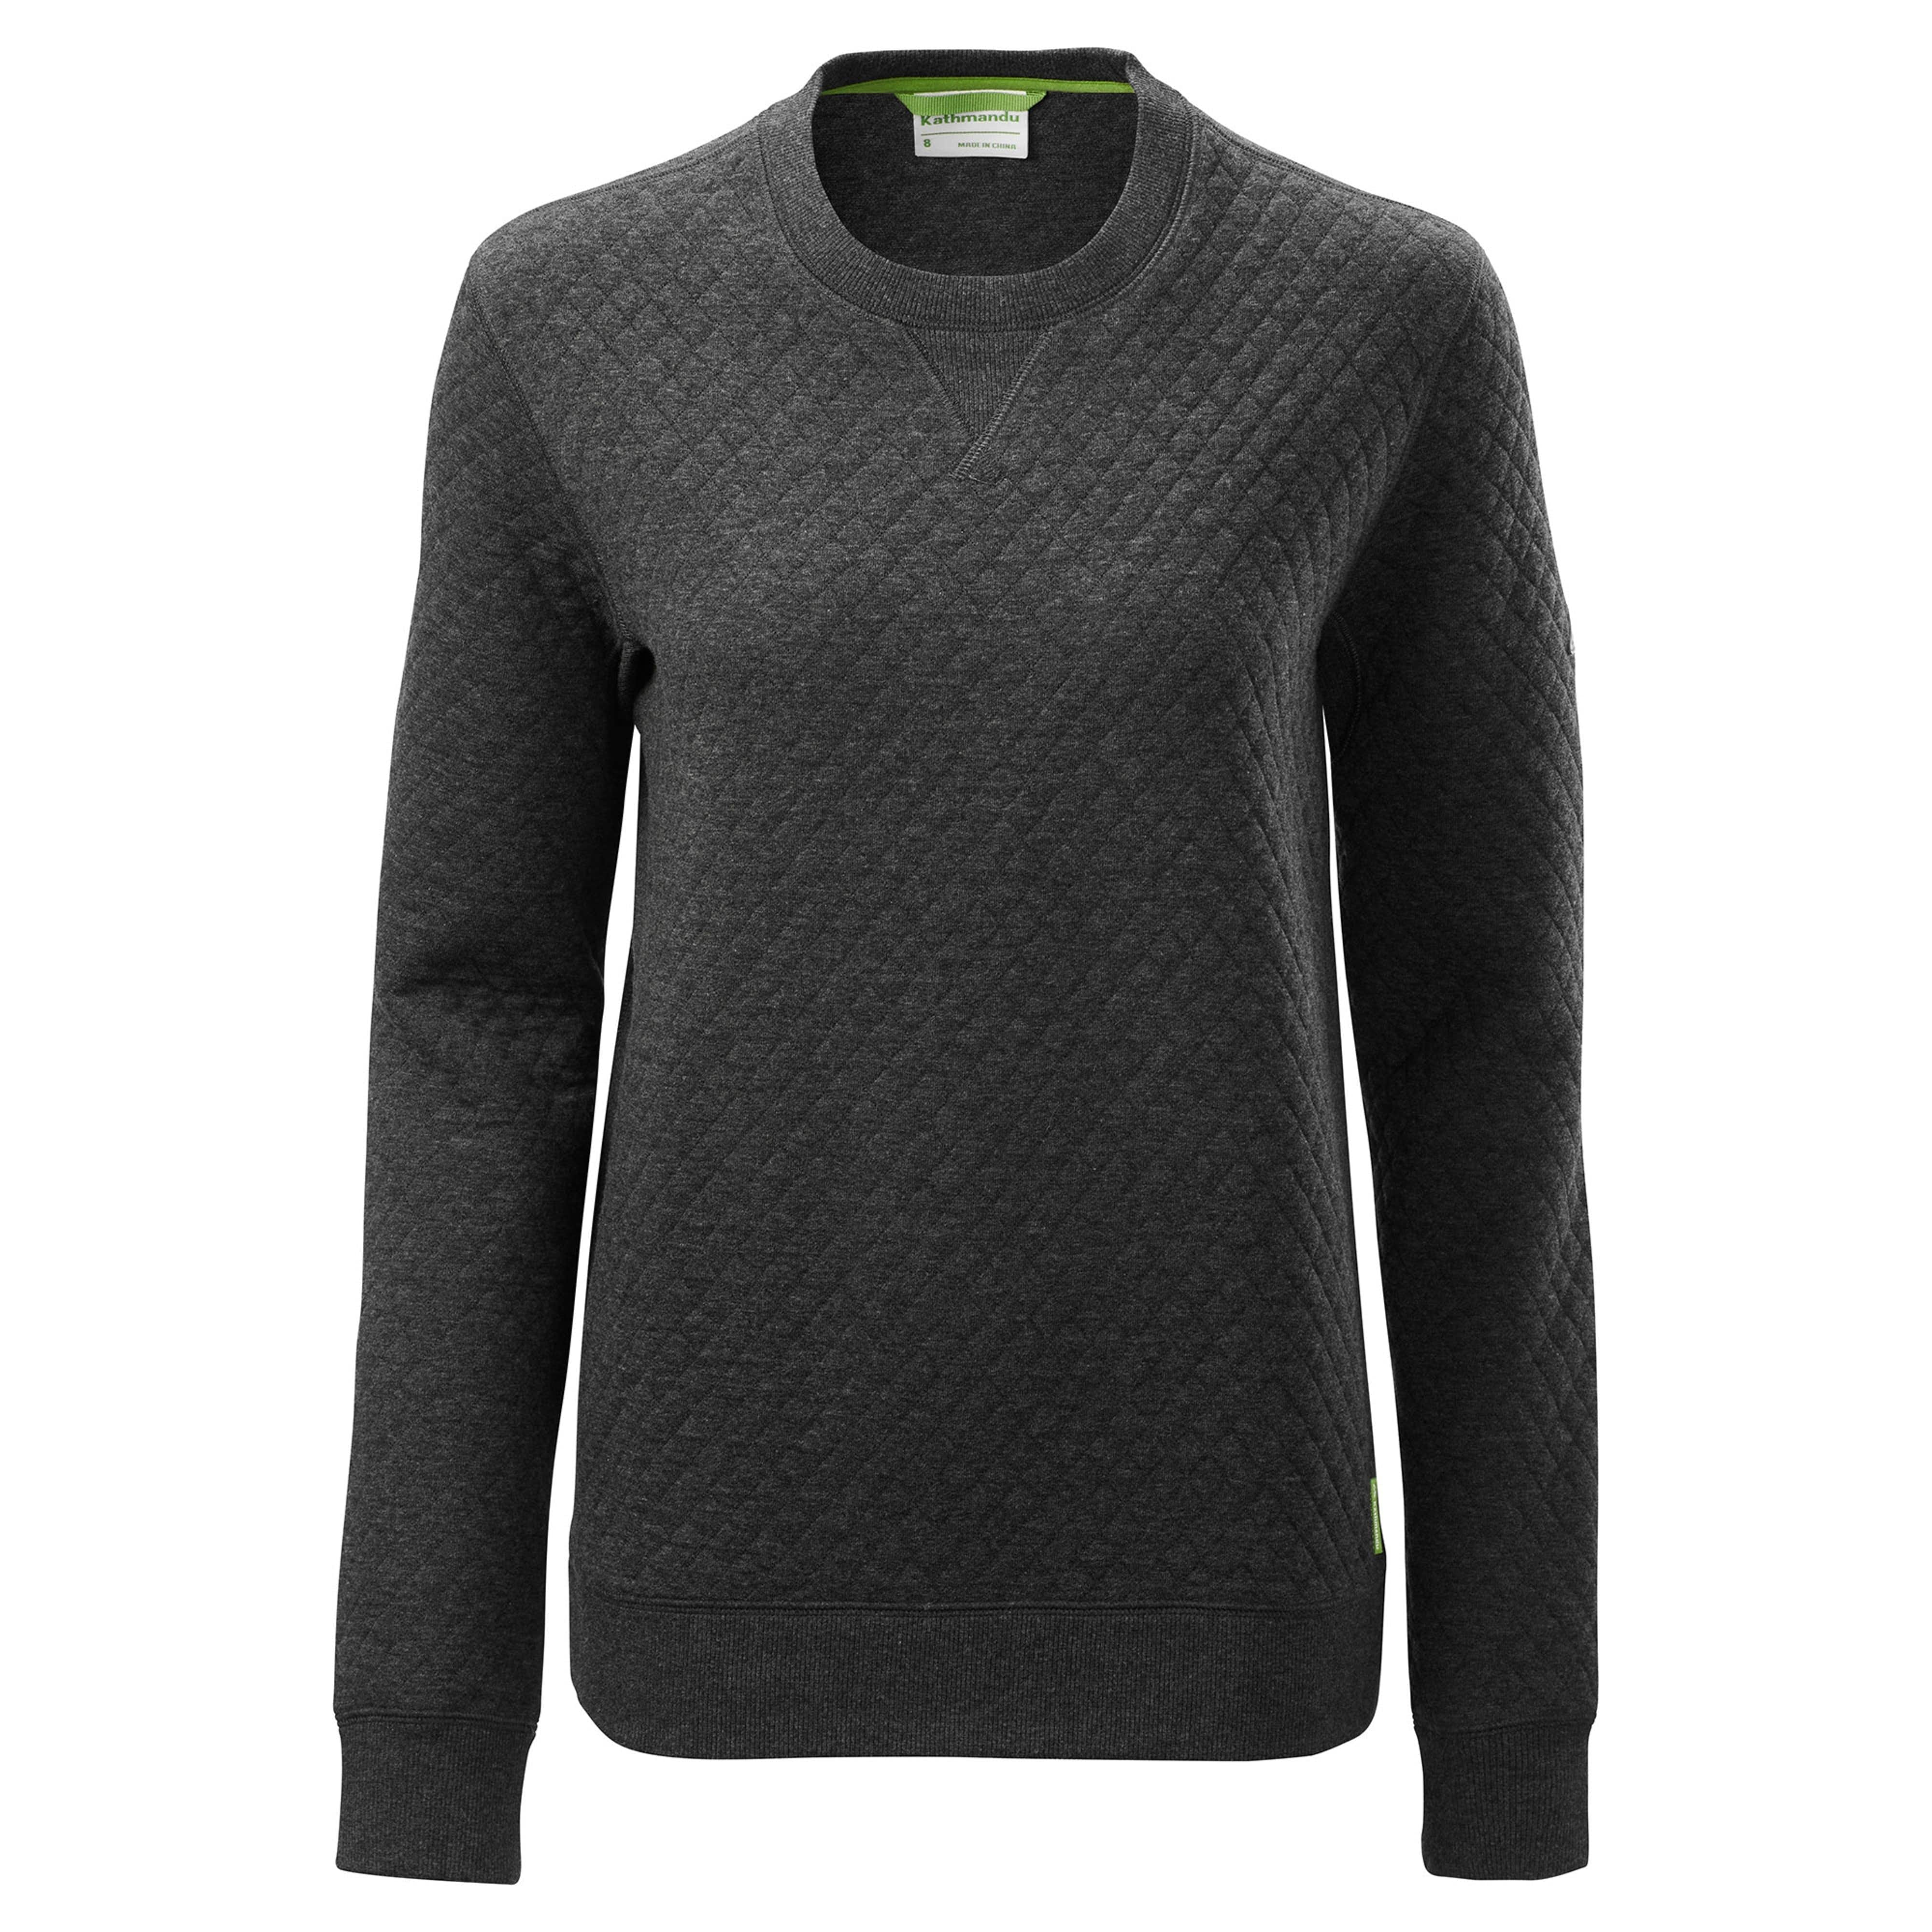 7449a031 Womens Hoodies & Pullovers | Zip Up Hoodies for Women | AU